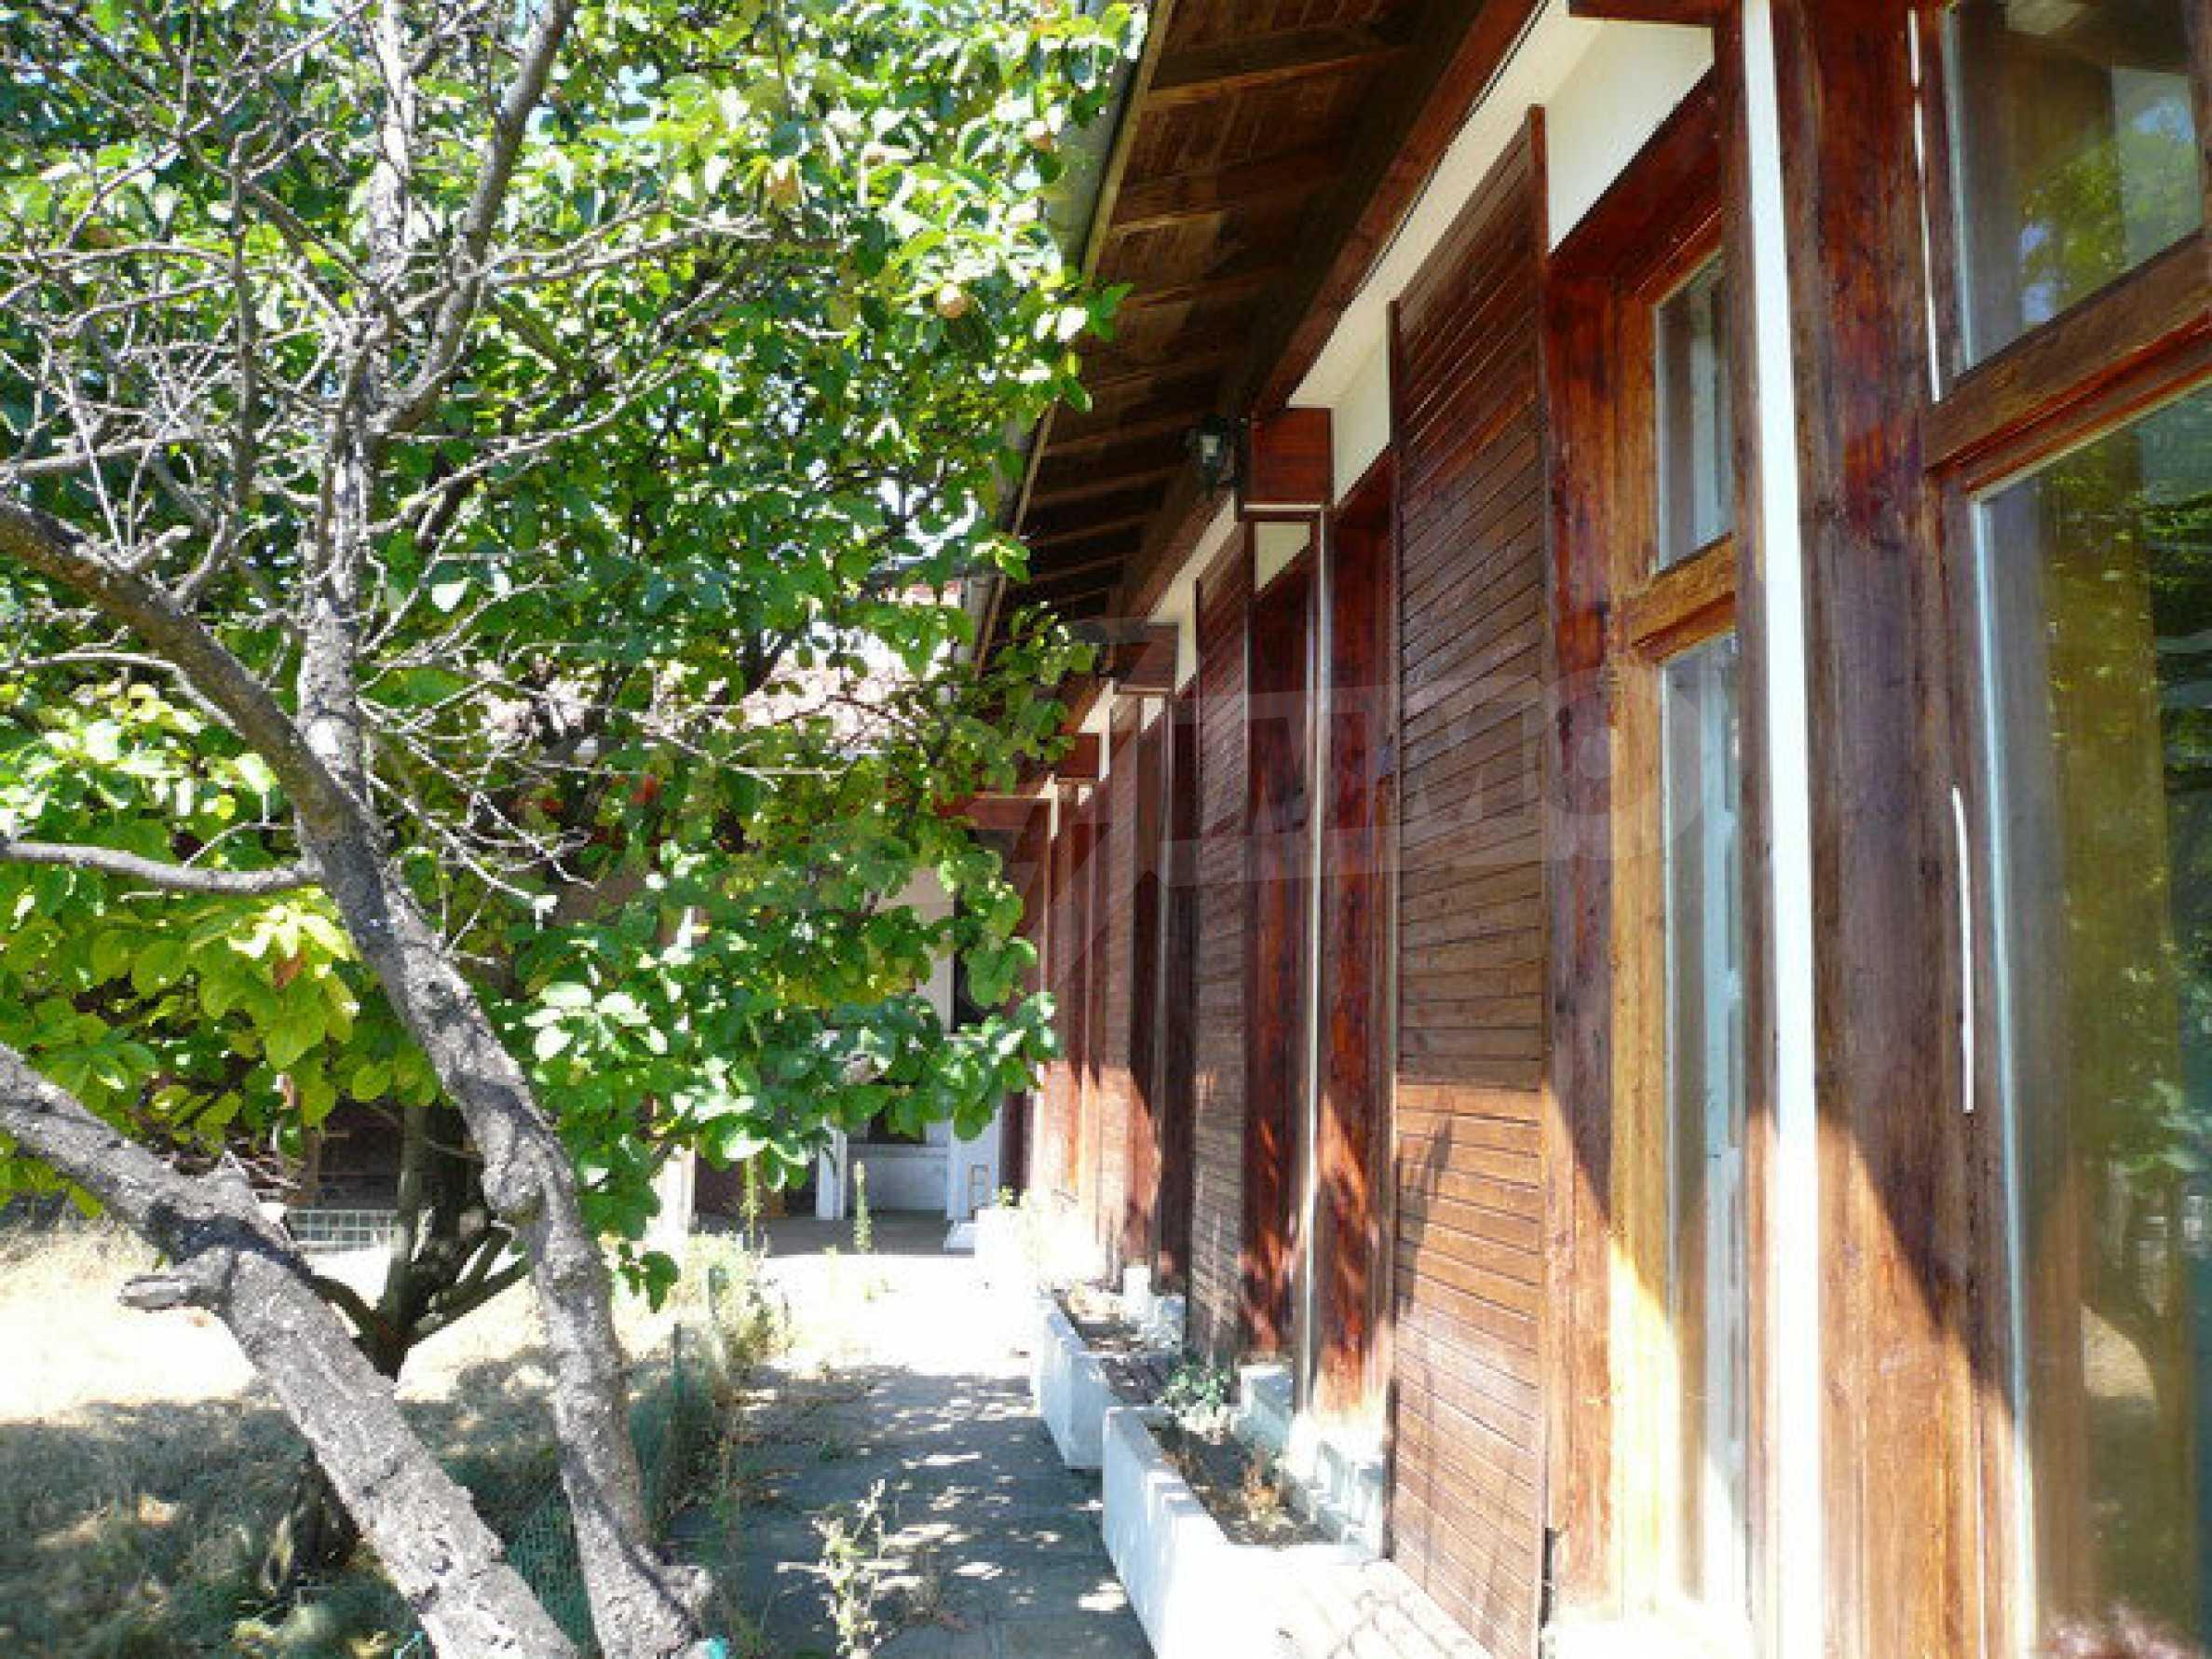 Renoviertes Haus nur 3 km von Veliko Tarnovo entfernt 2